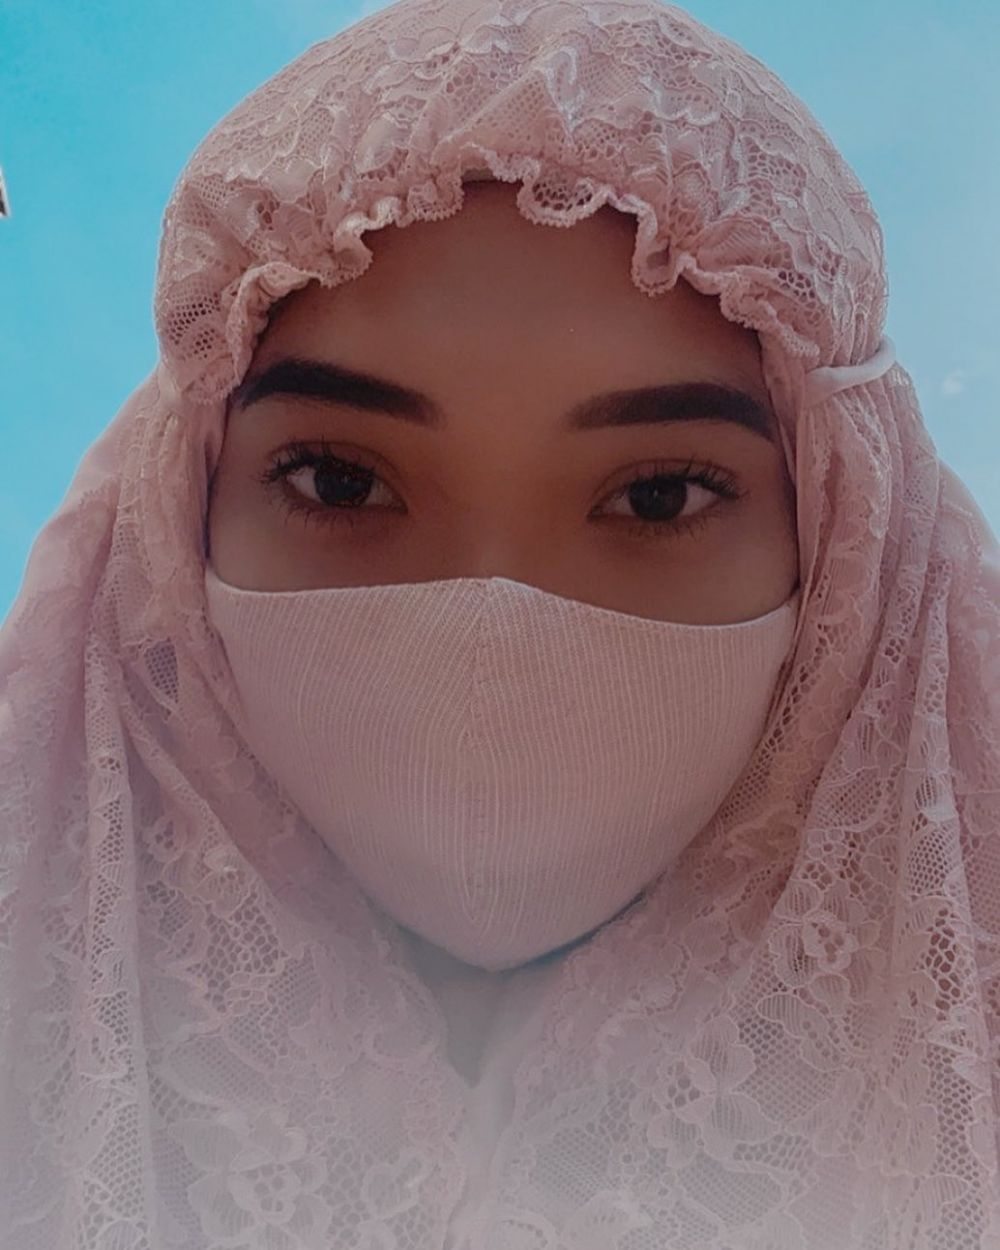 6 Seleb rayakan Idul Fitri 2020 pertama kali setelah jadi mualaf © 2020 brilio.net